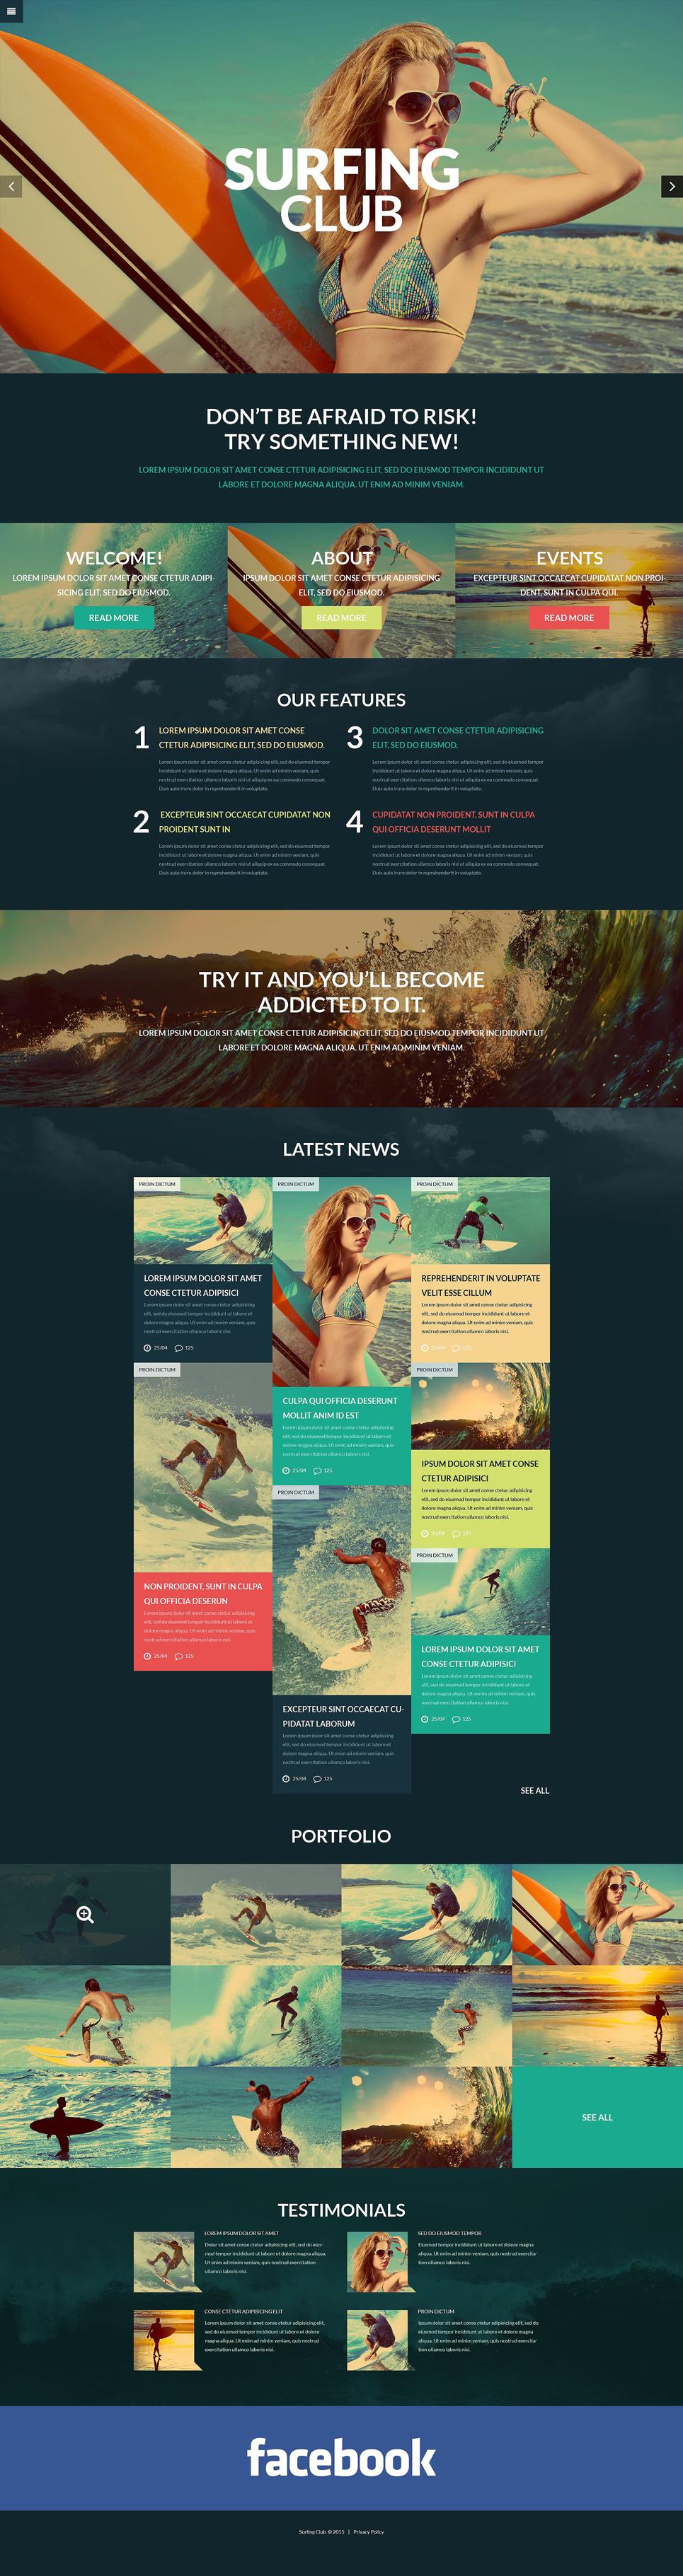 Адаптивный шаблон сайта на тему серфинг #52824